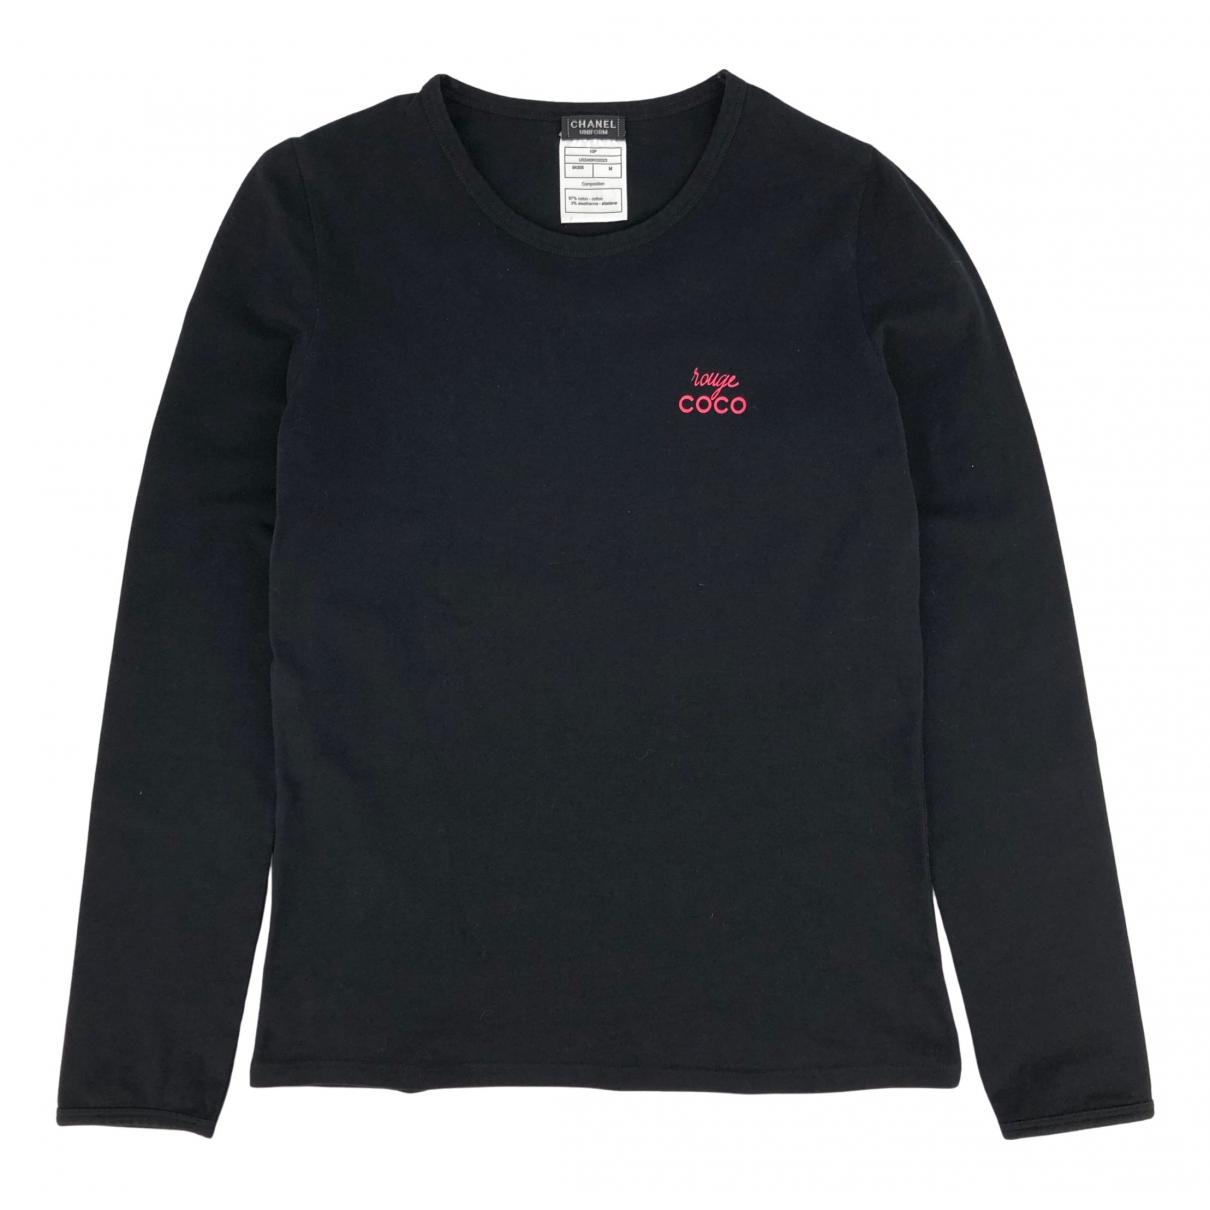 Chanel \N Black Cotton  top for Women M International